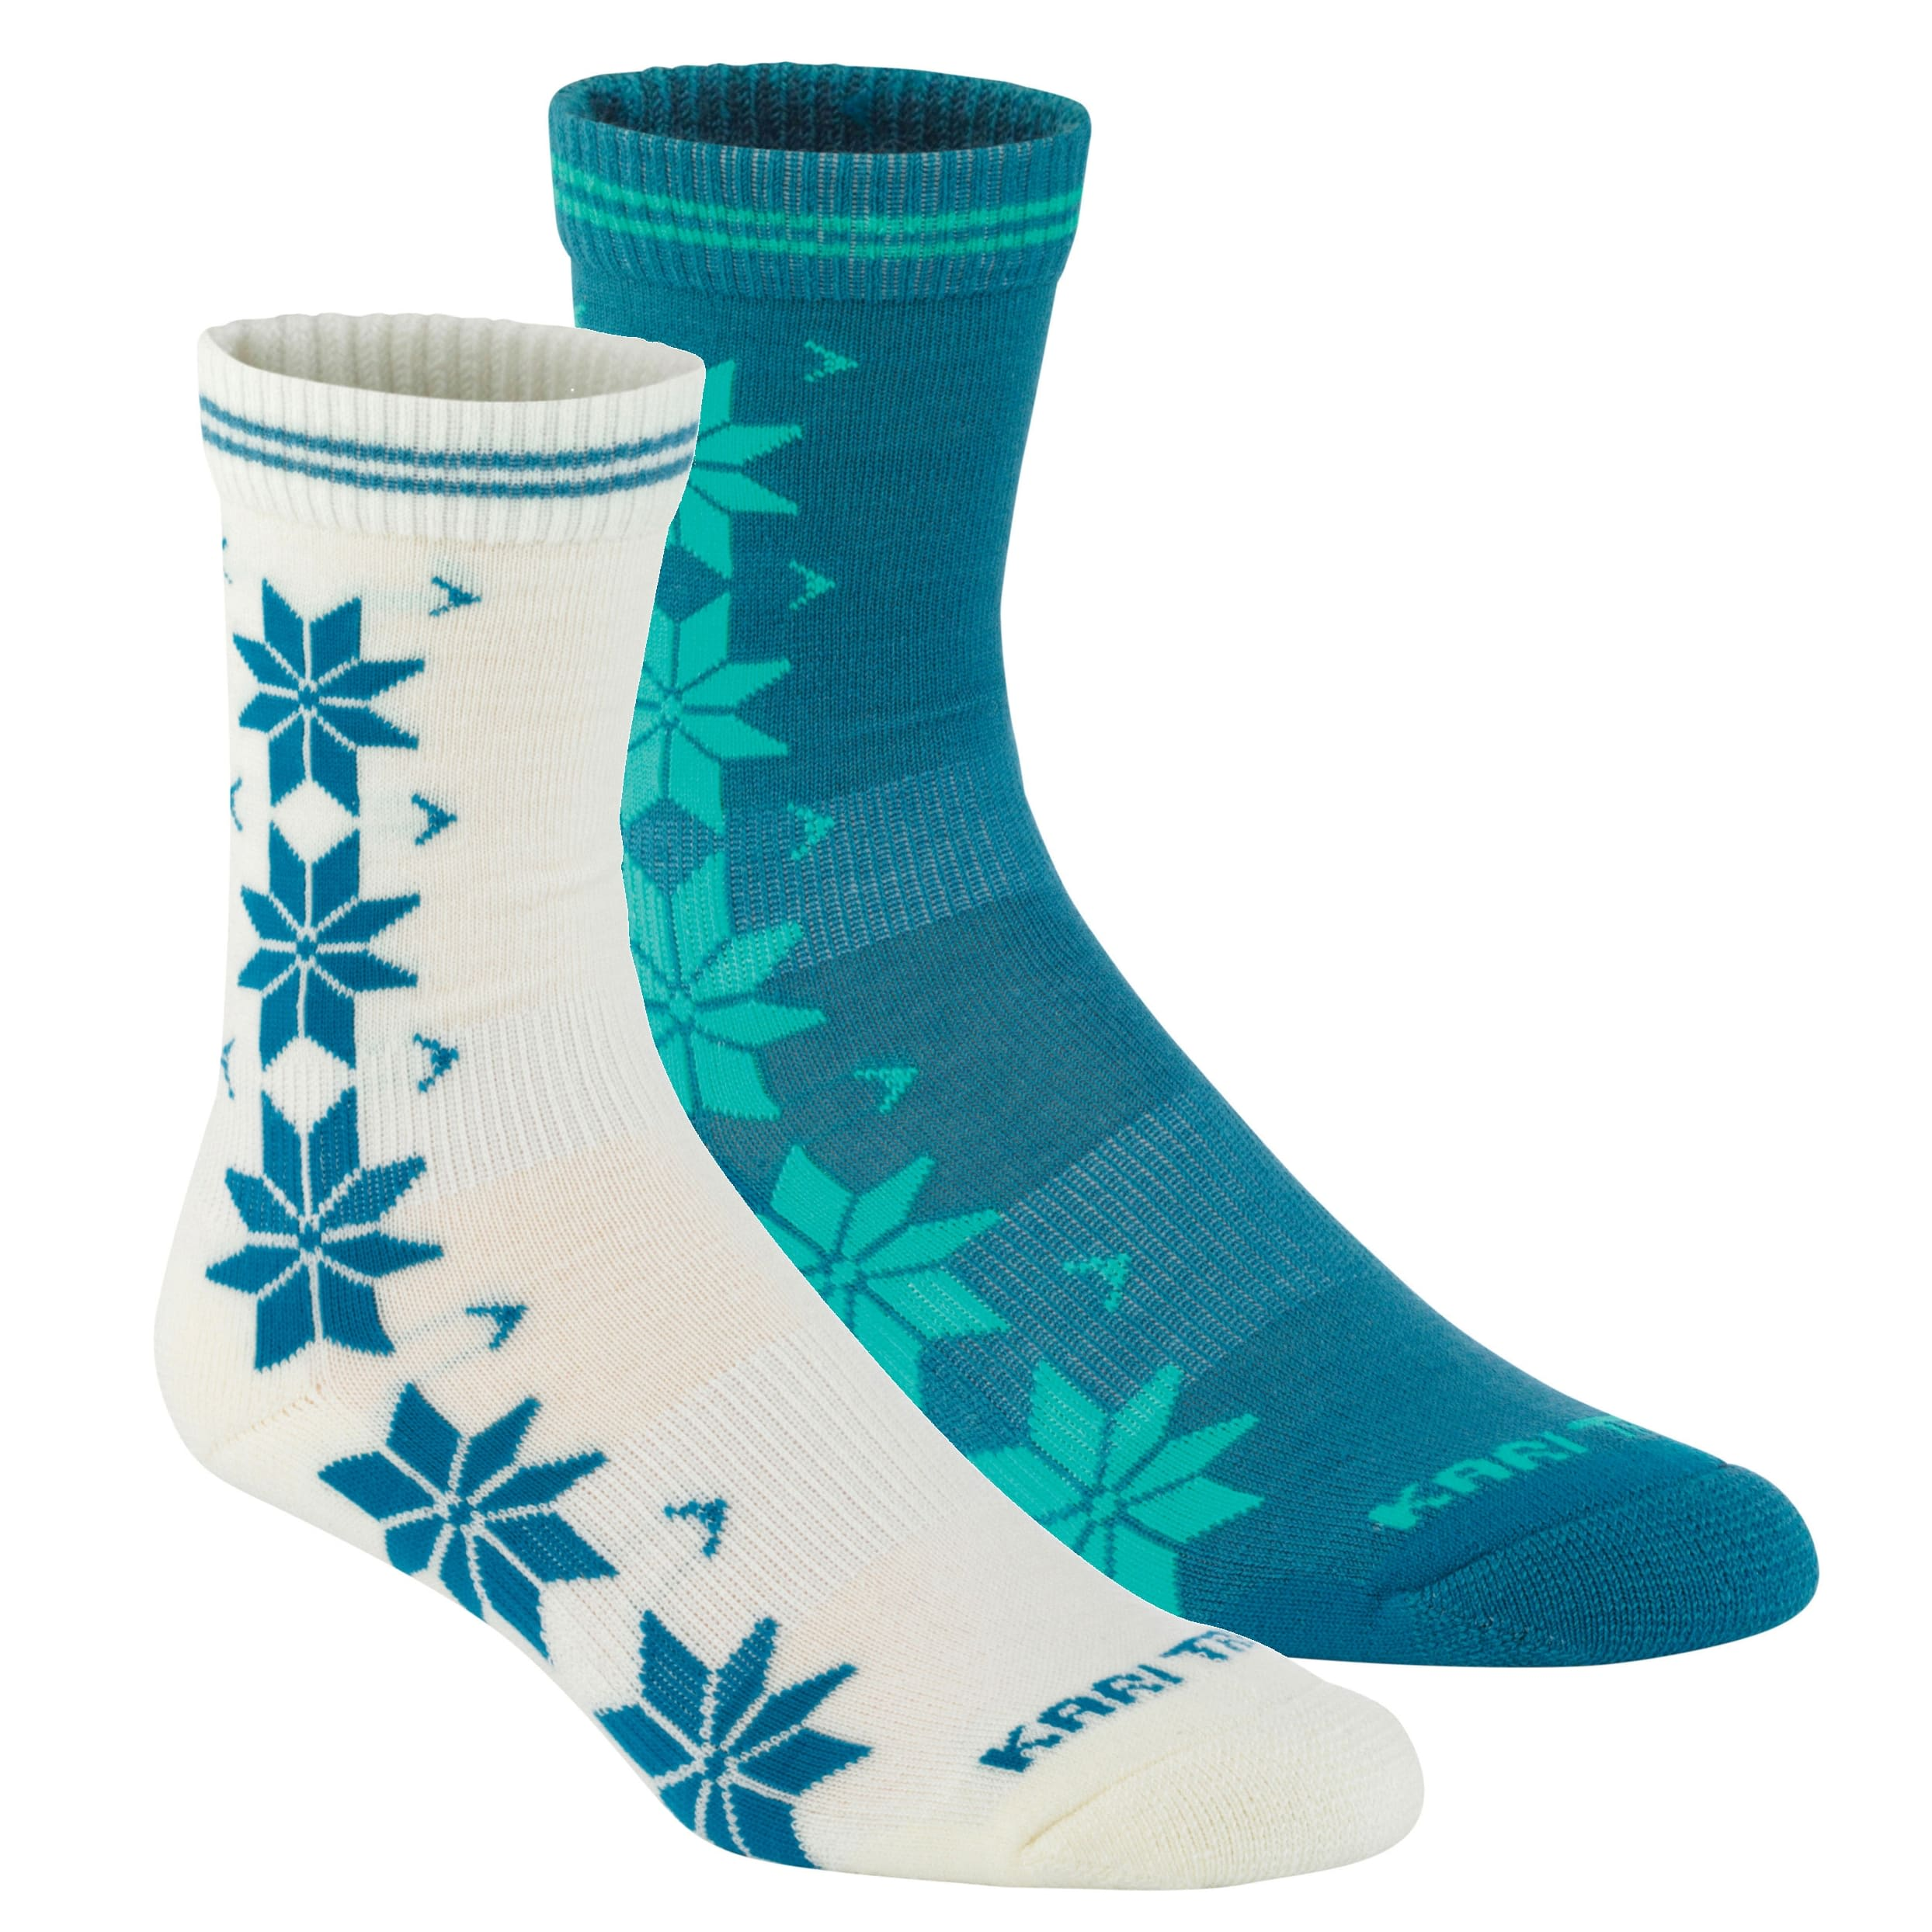 Buy Kari Traa Vinst Wool Sock 2pk from Outnorth 4ab6ca10d5